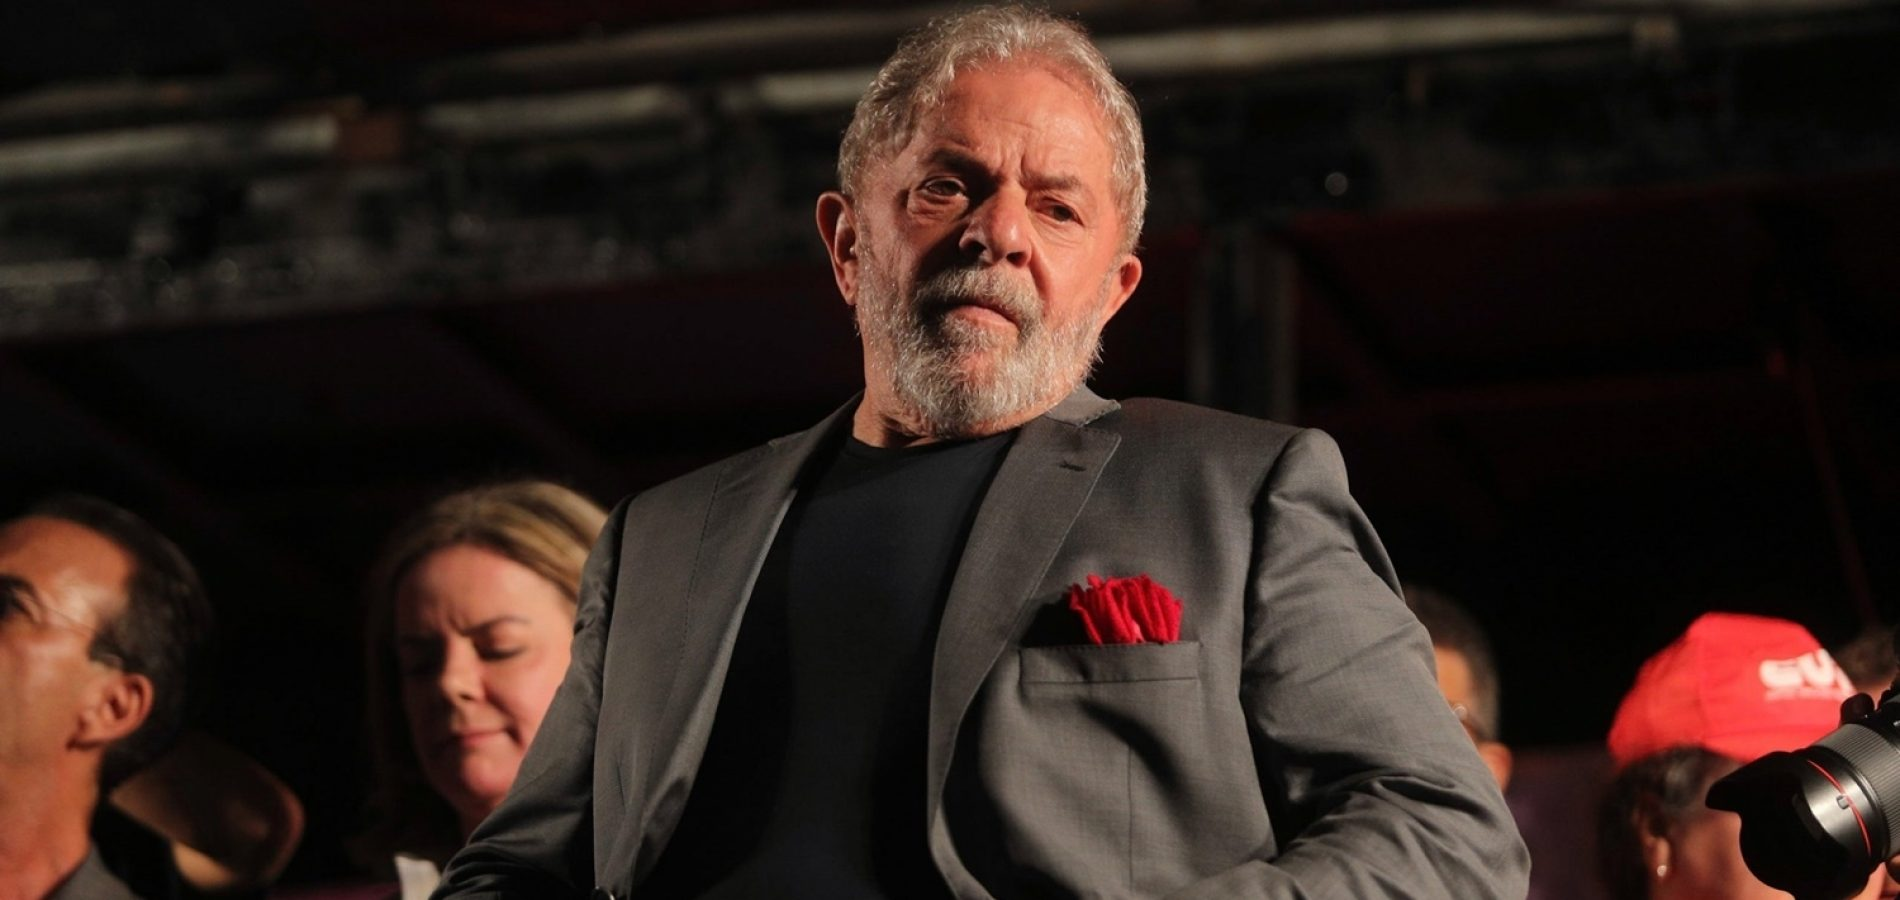 'É maluquice', diz Lula sobre renúncia de Haddad